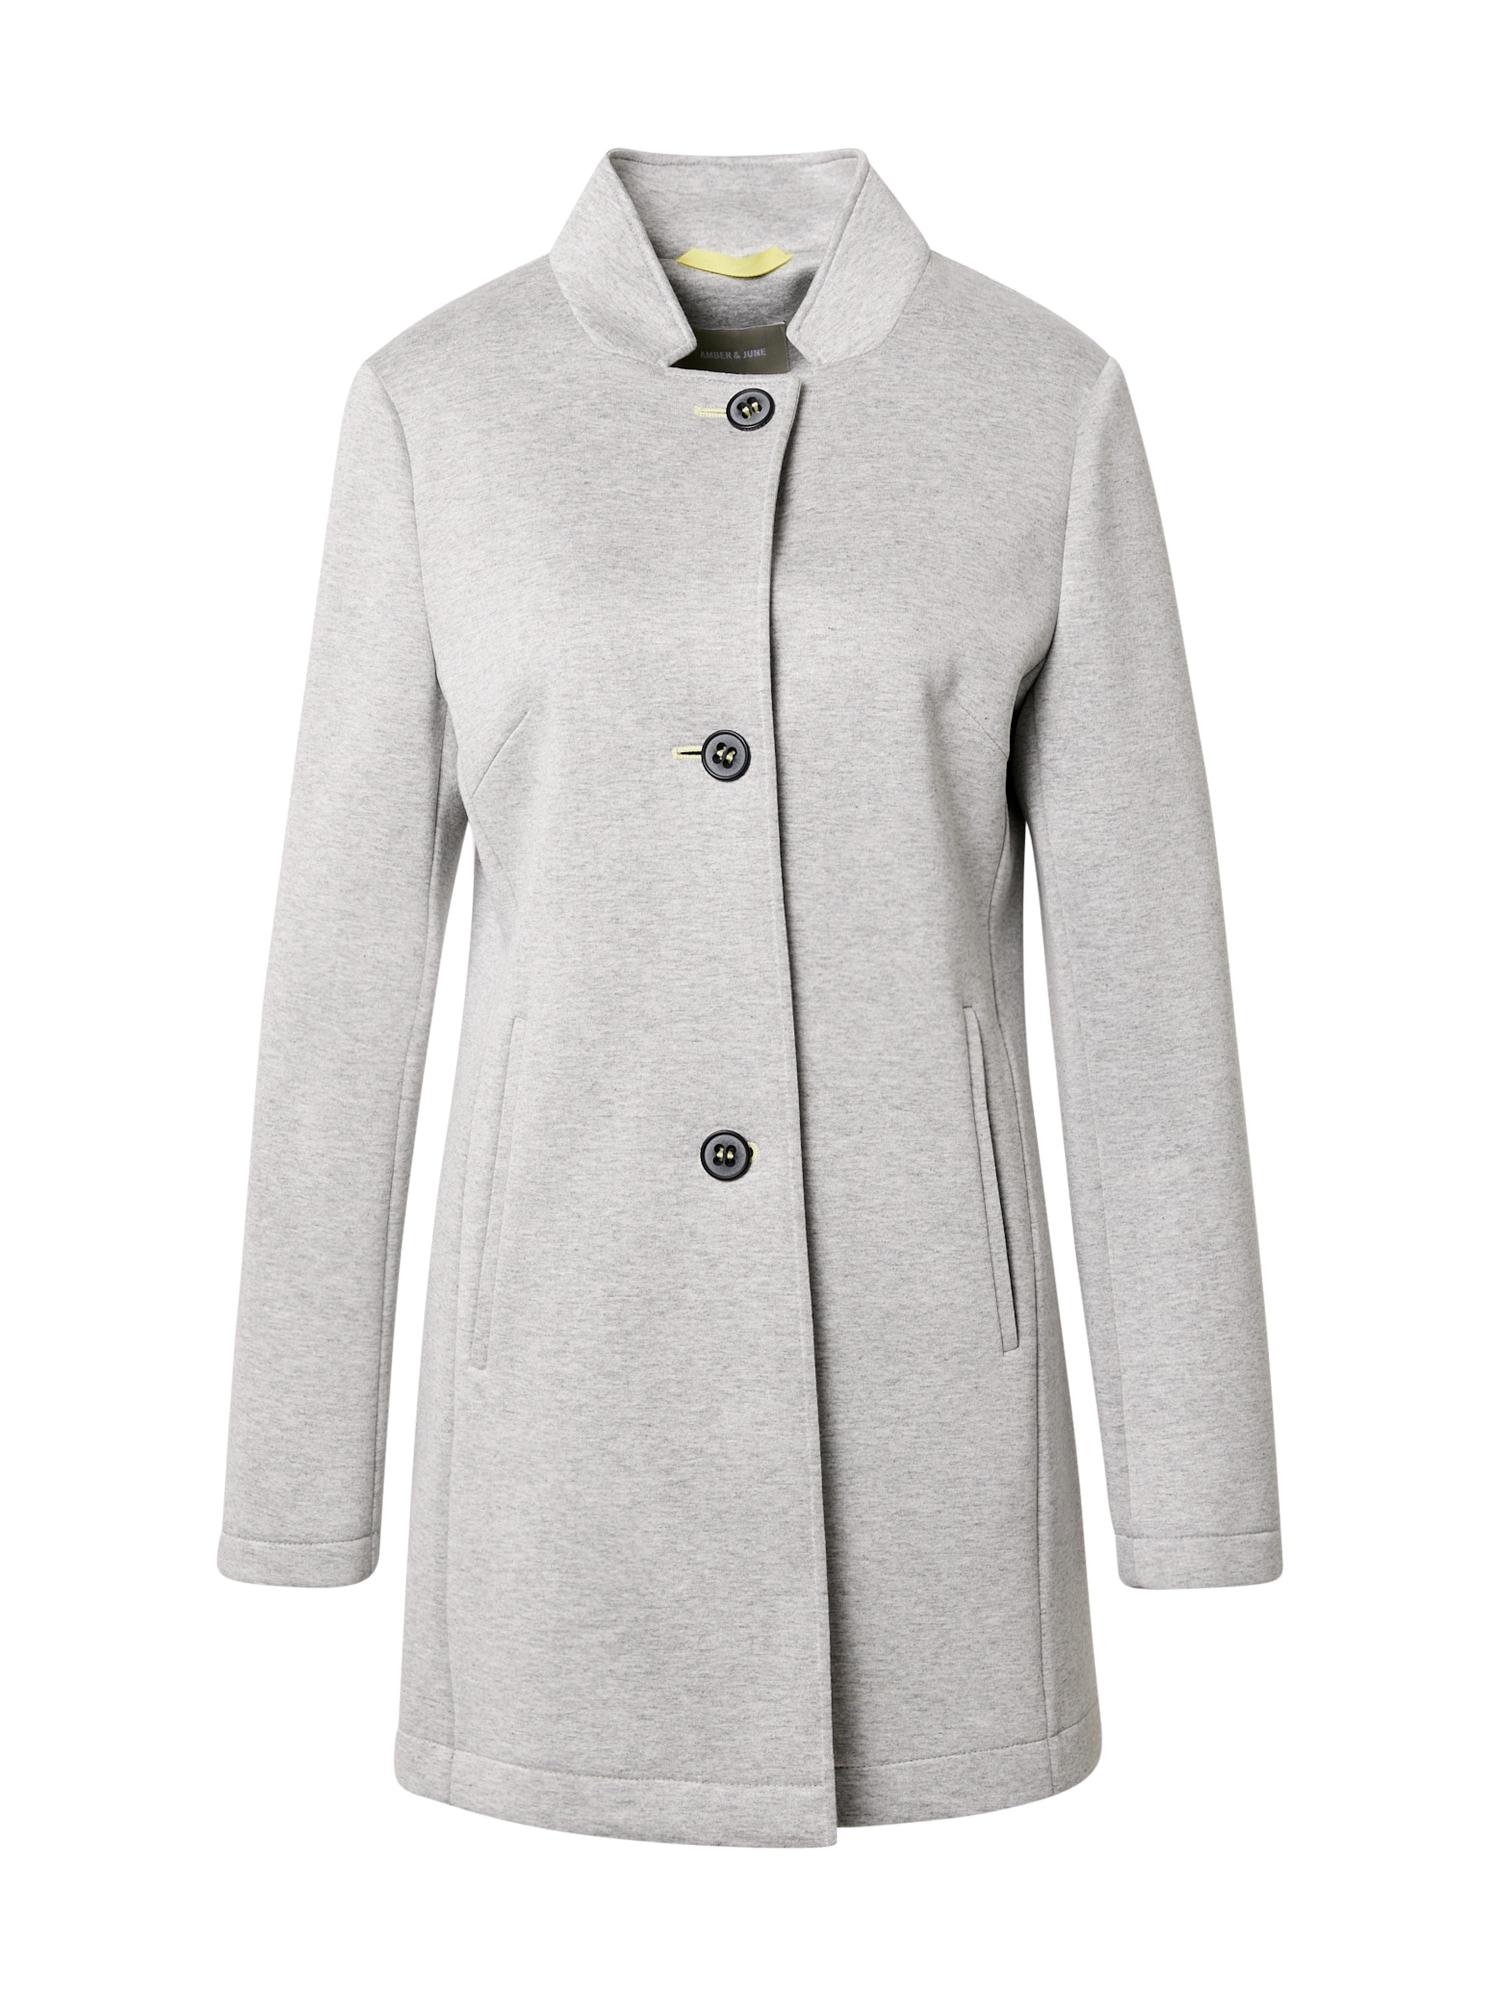 Amber & June Demisezoninis paltas margai pilka